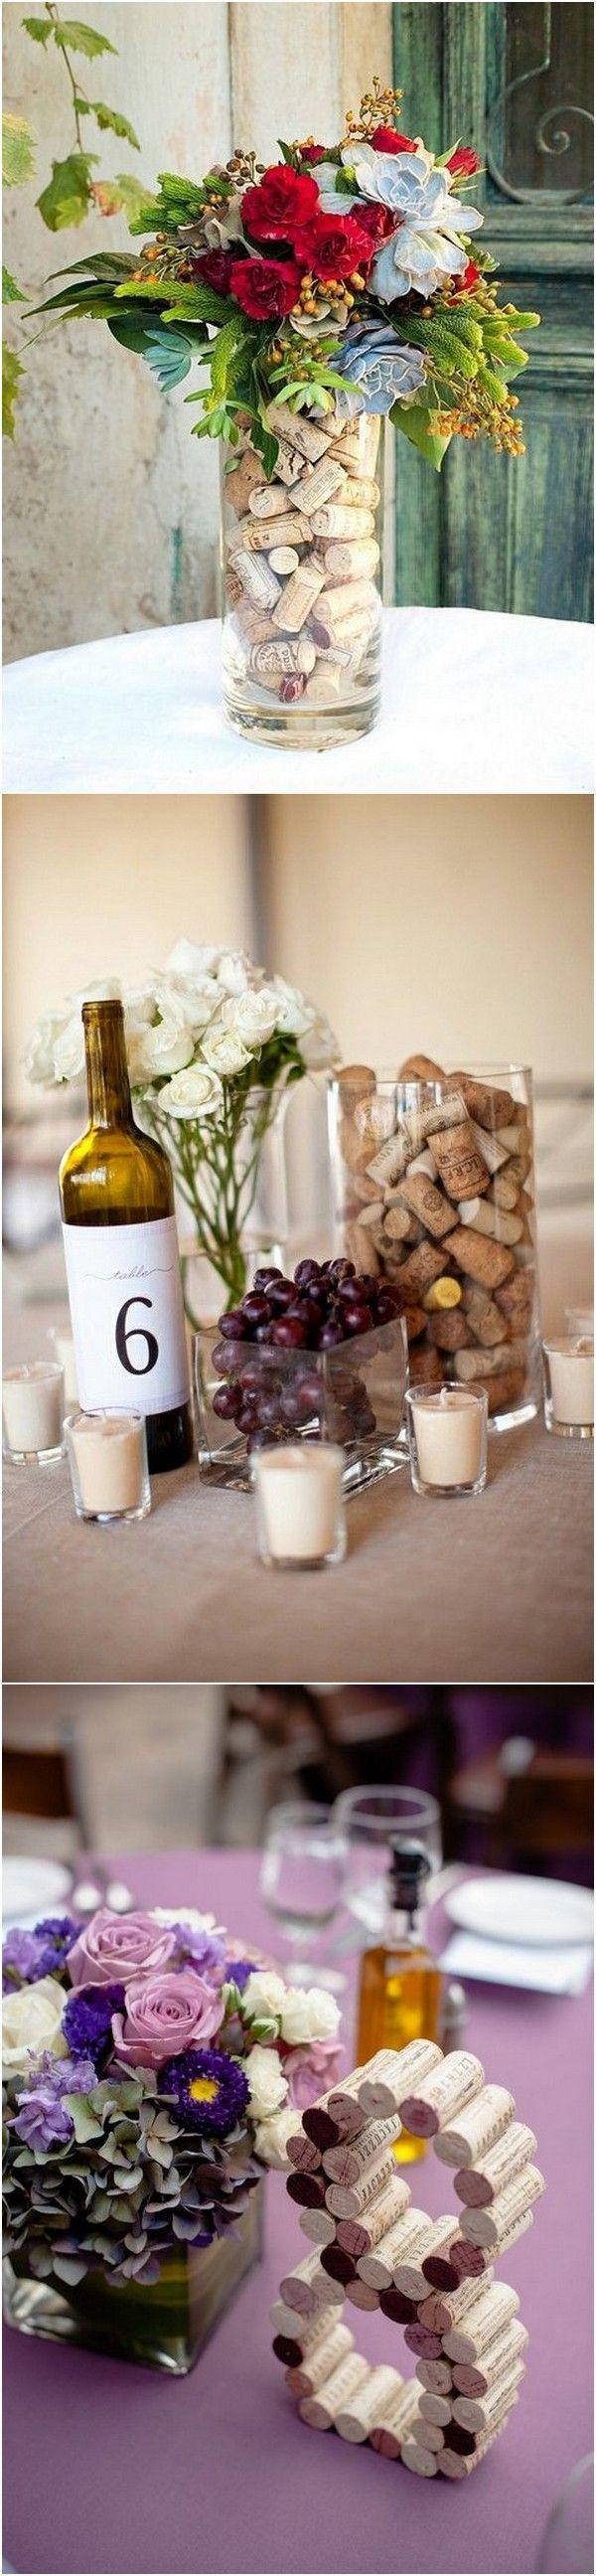 wine themed wedding centerpieces with wine corks #weddingideas #weddingdecor #weddingtrends #weddingthemes #vineyardwedding #weddingaisle #weddingceremony